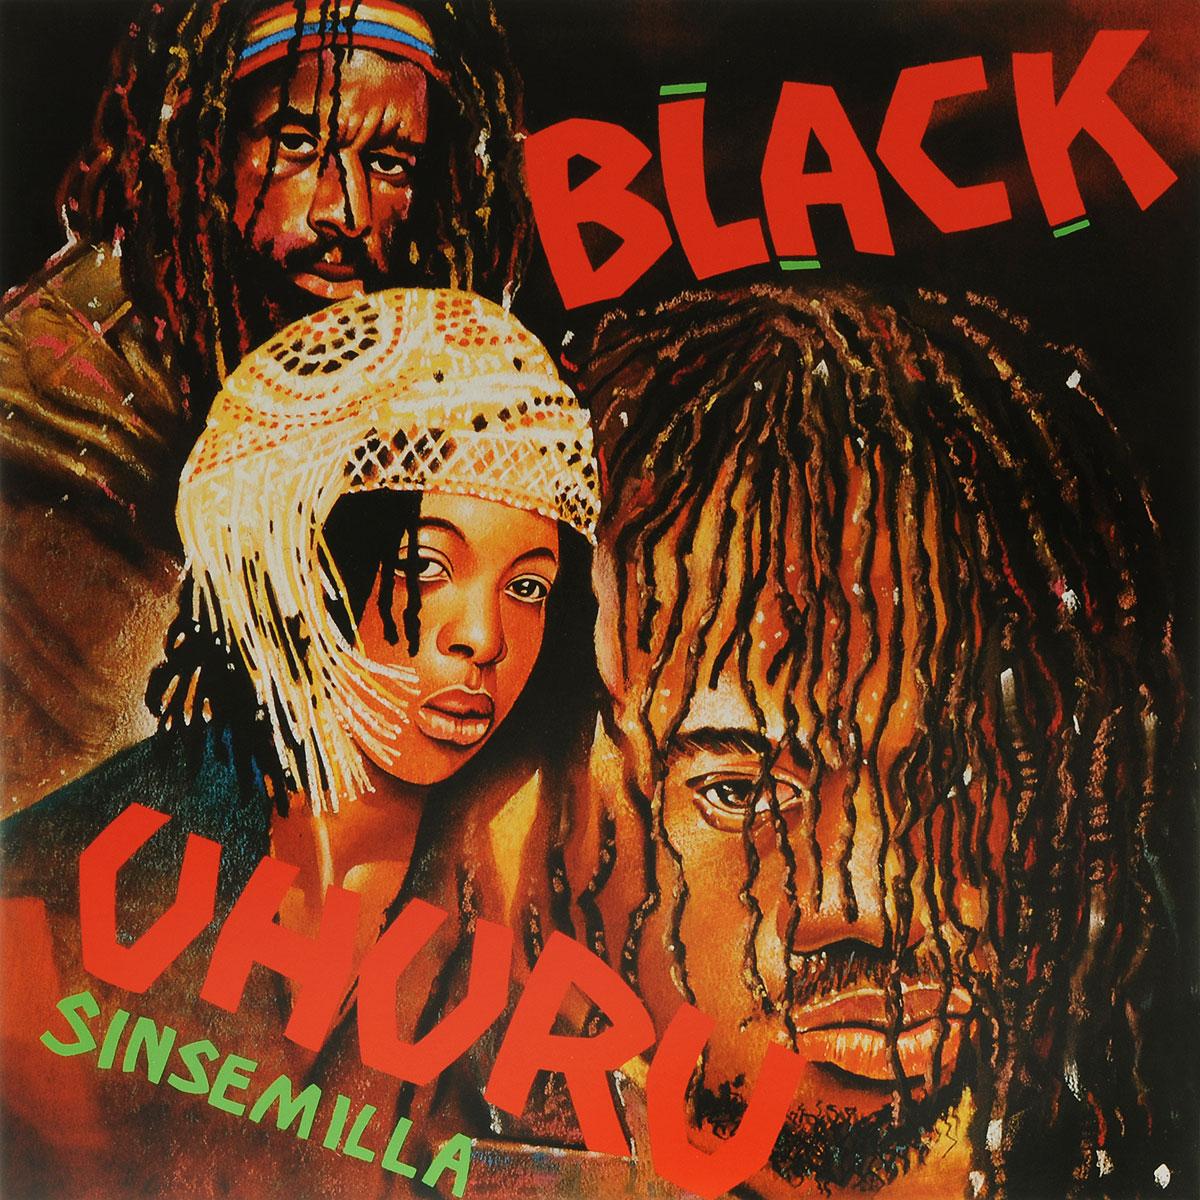 Black Uhuru Black Uhuru. Sinsemilla (LP)